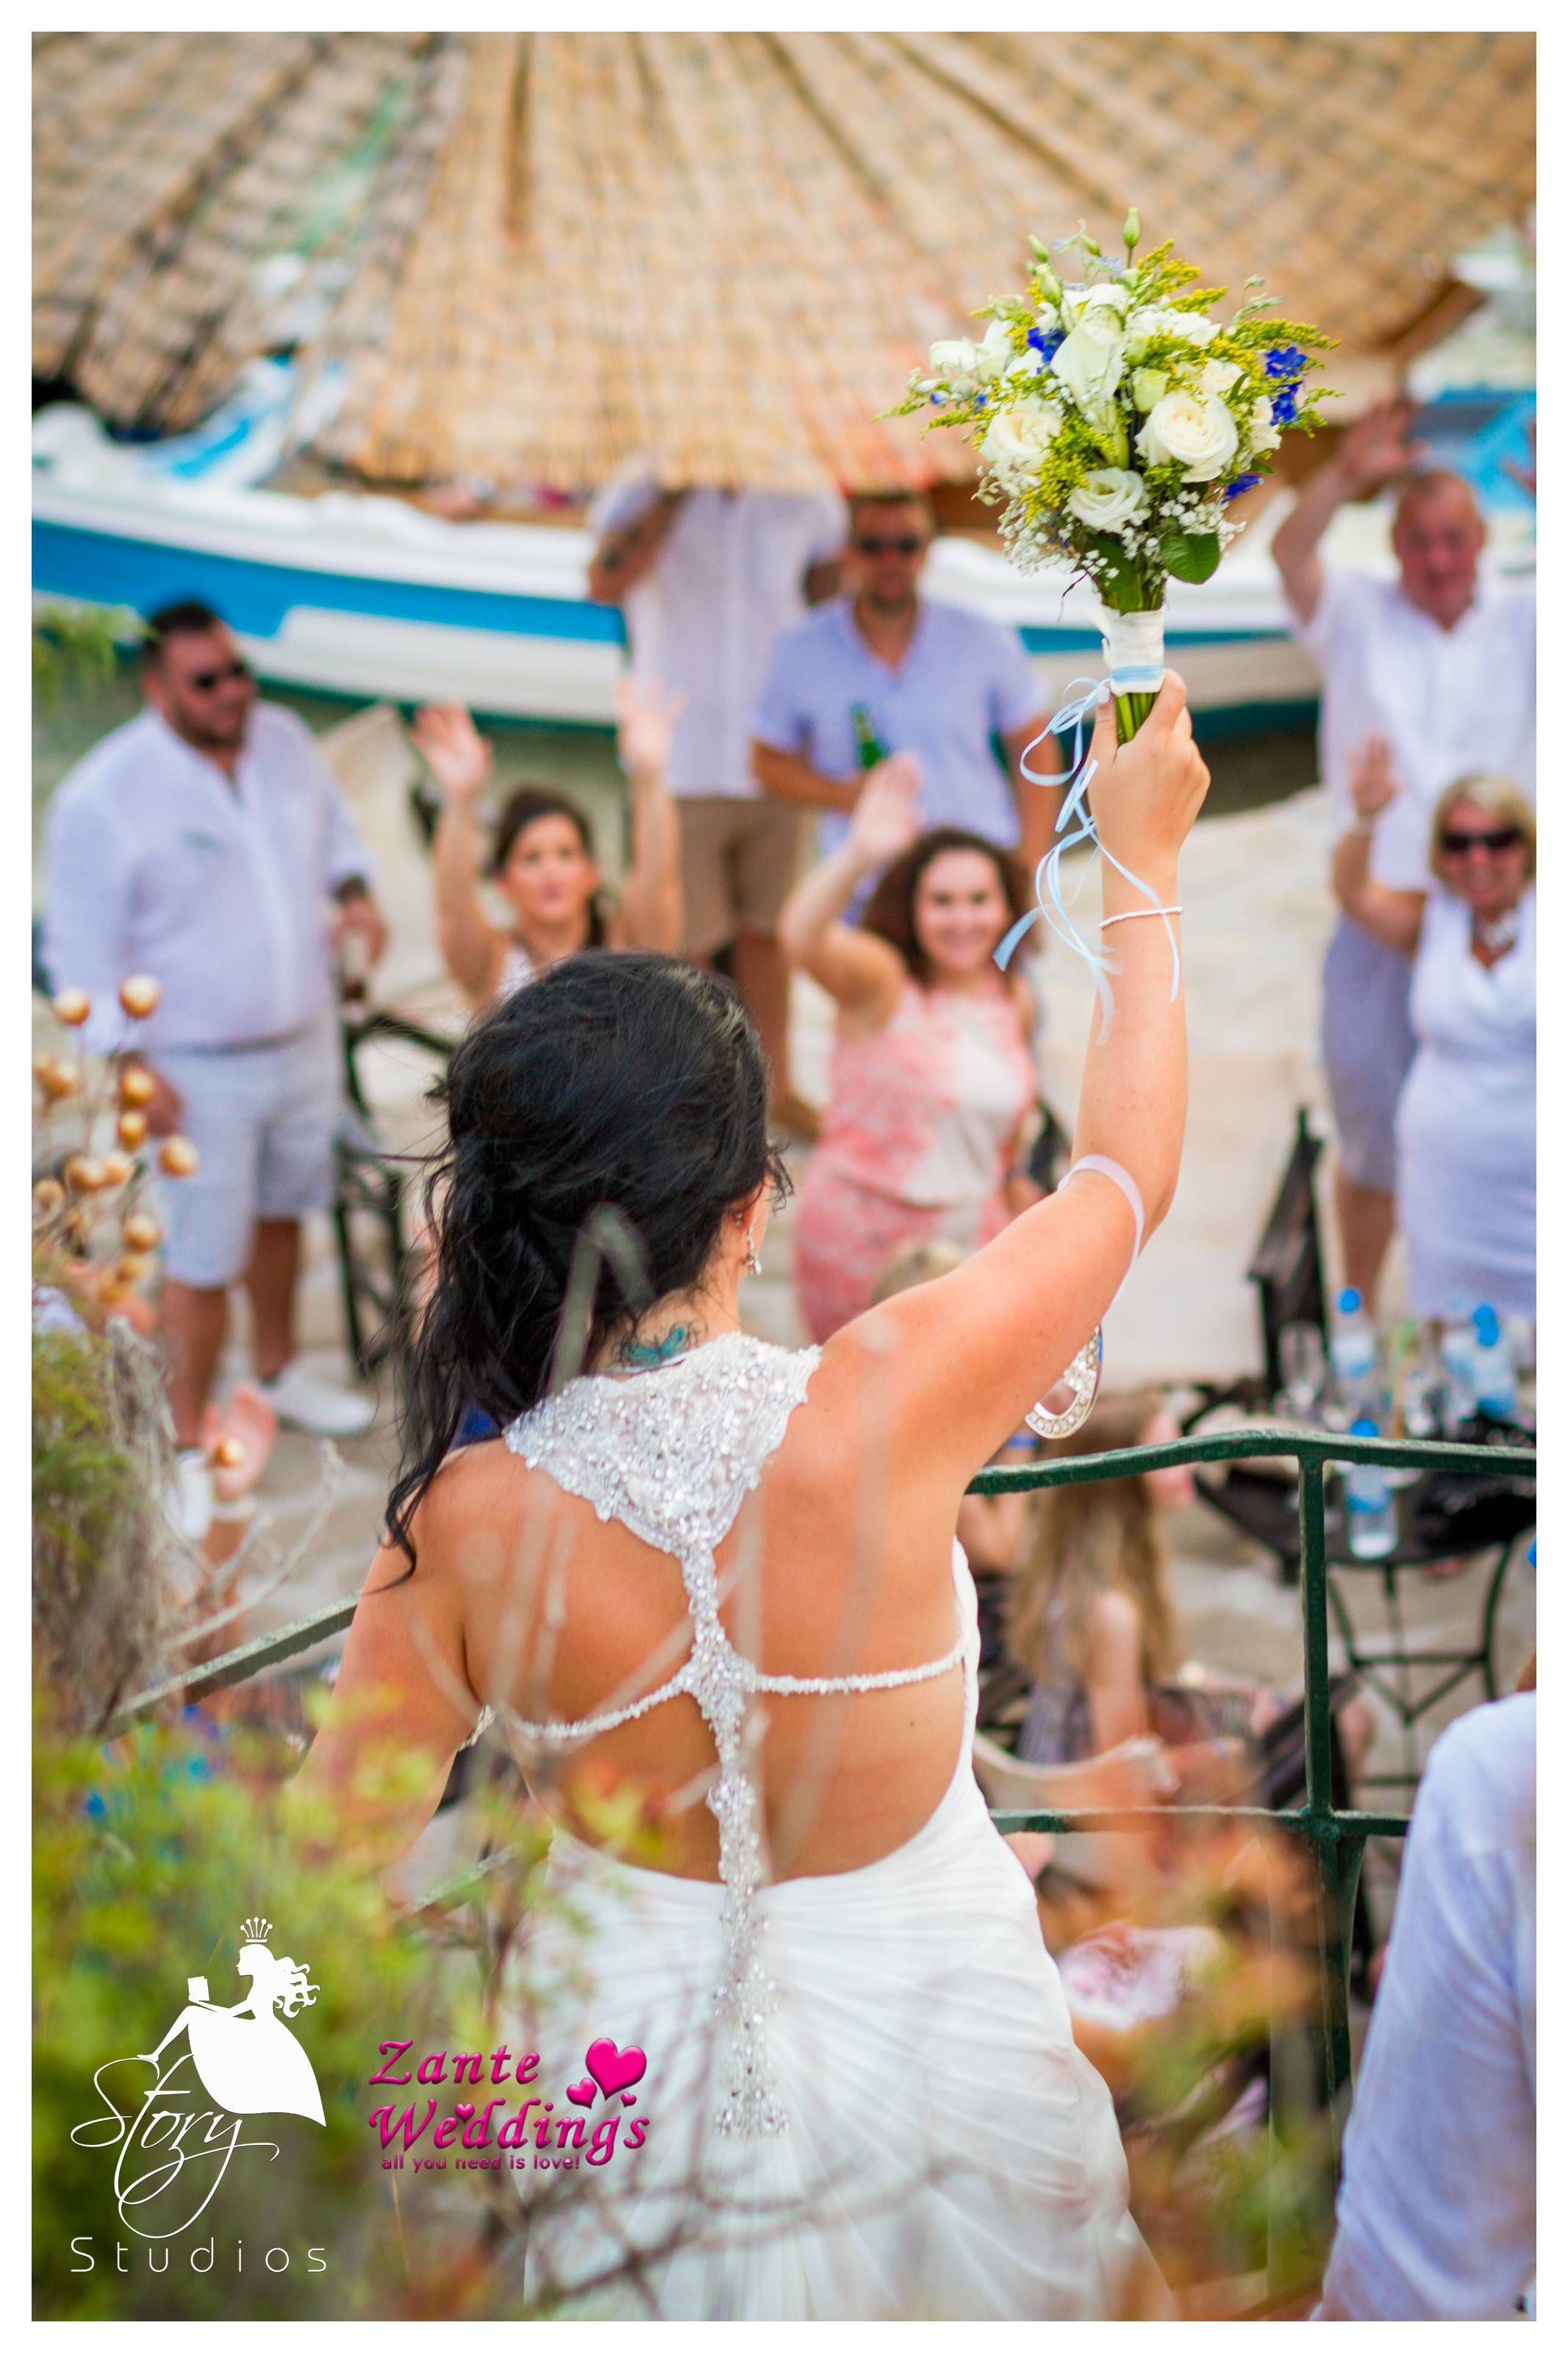 The bride preparing to through her bouquet